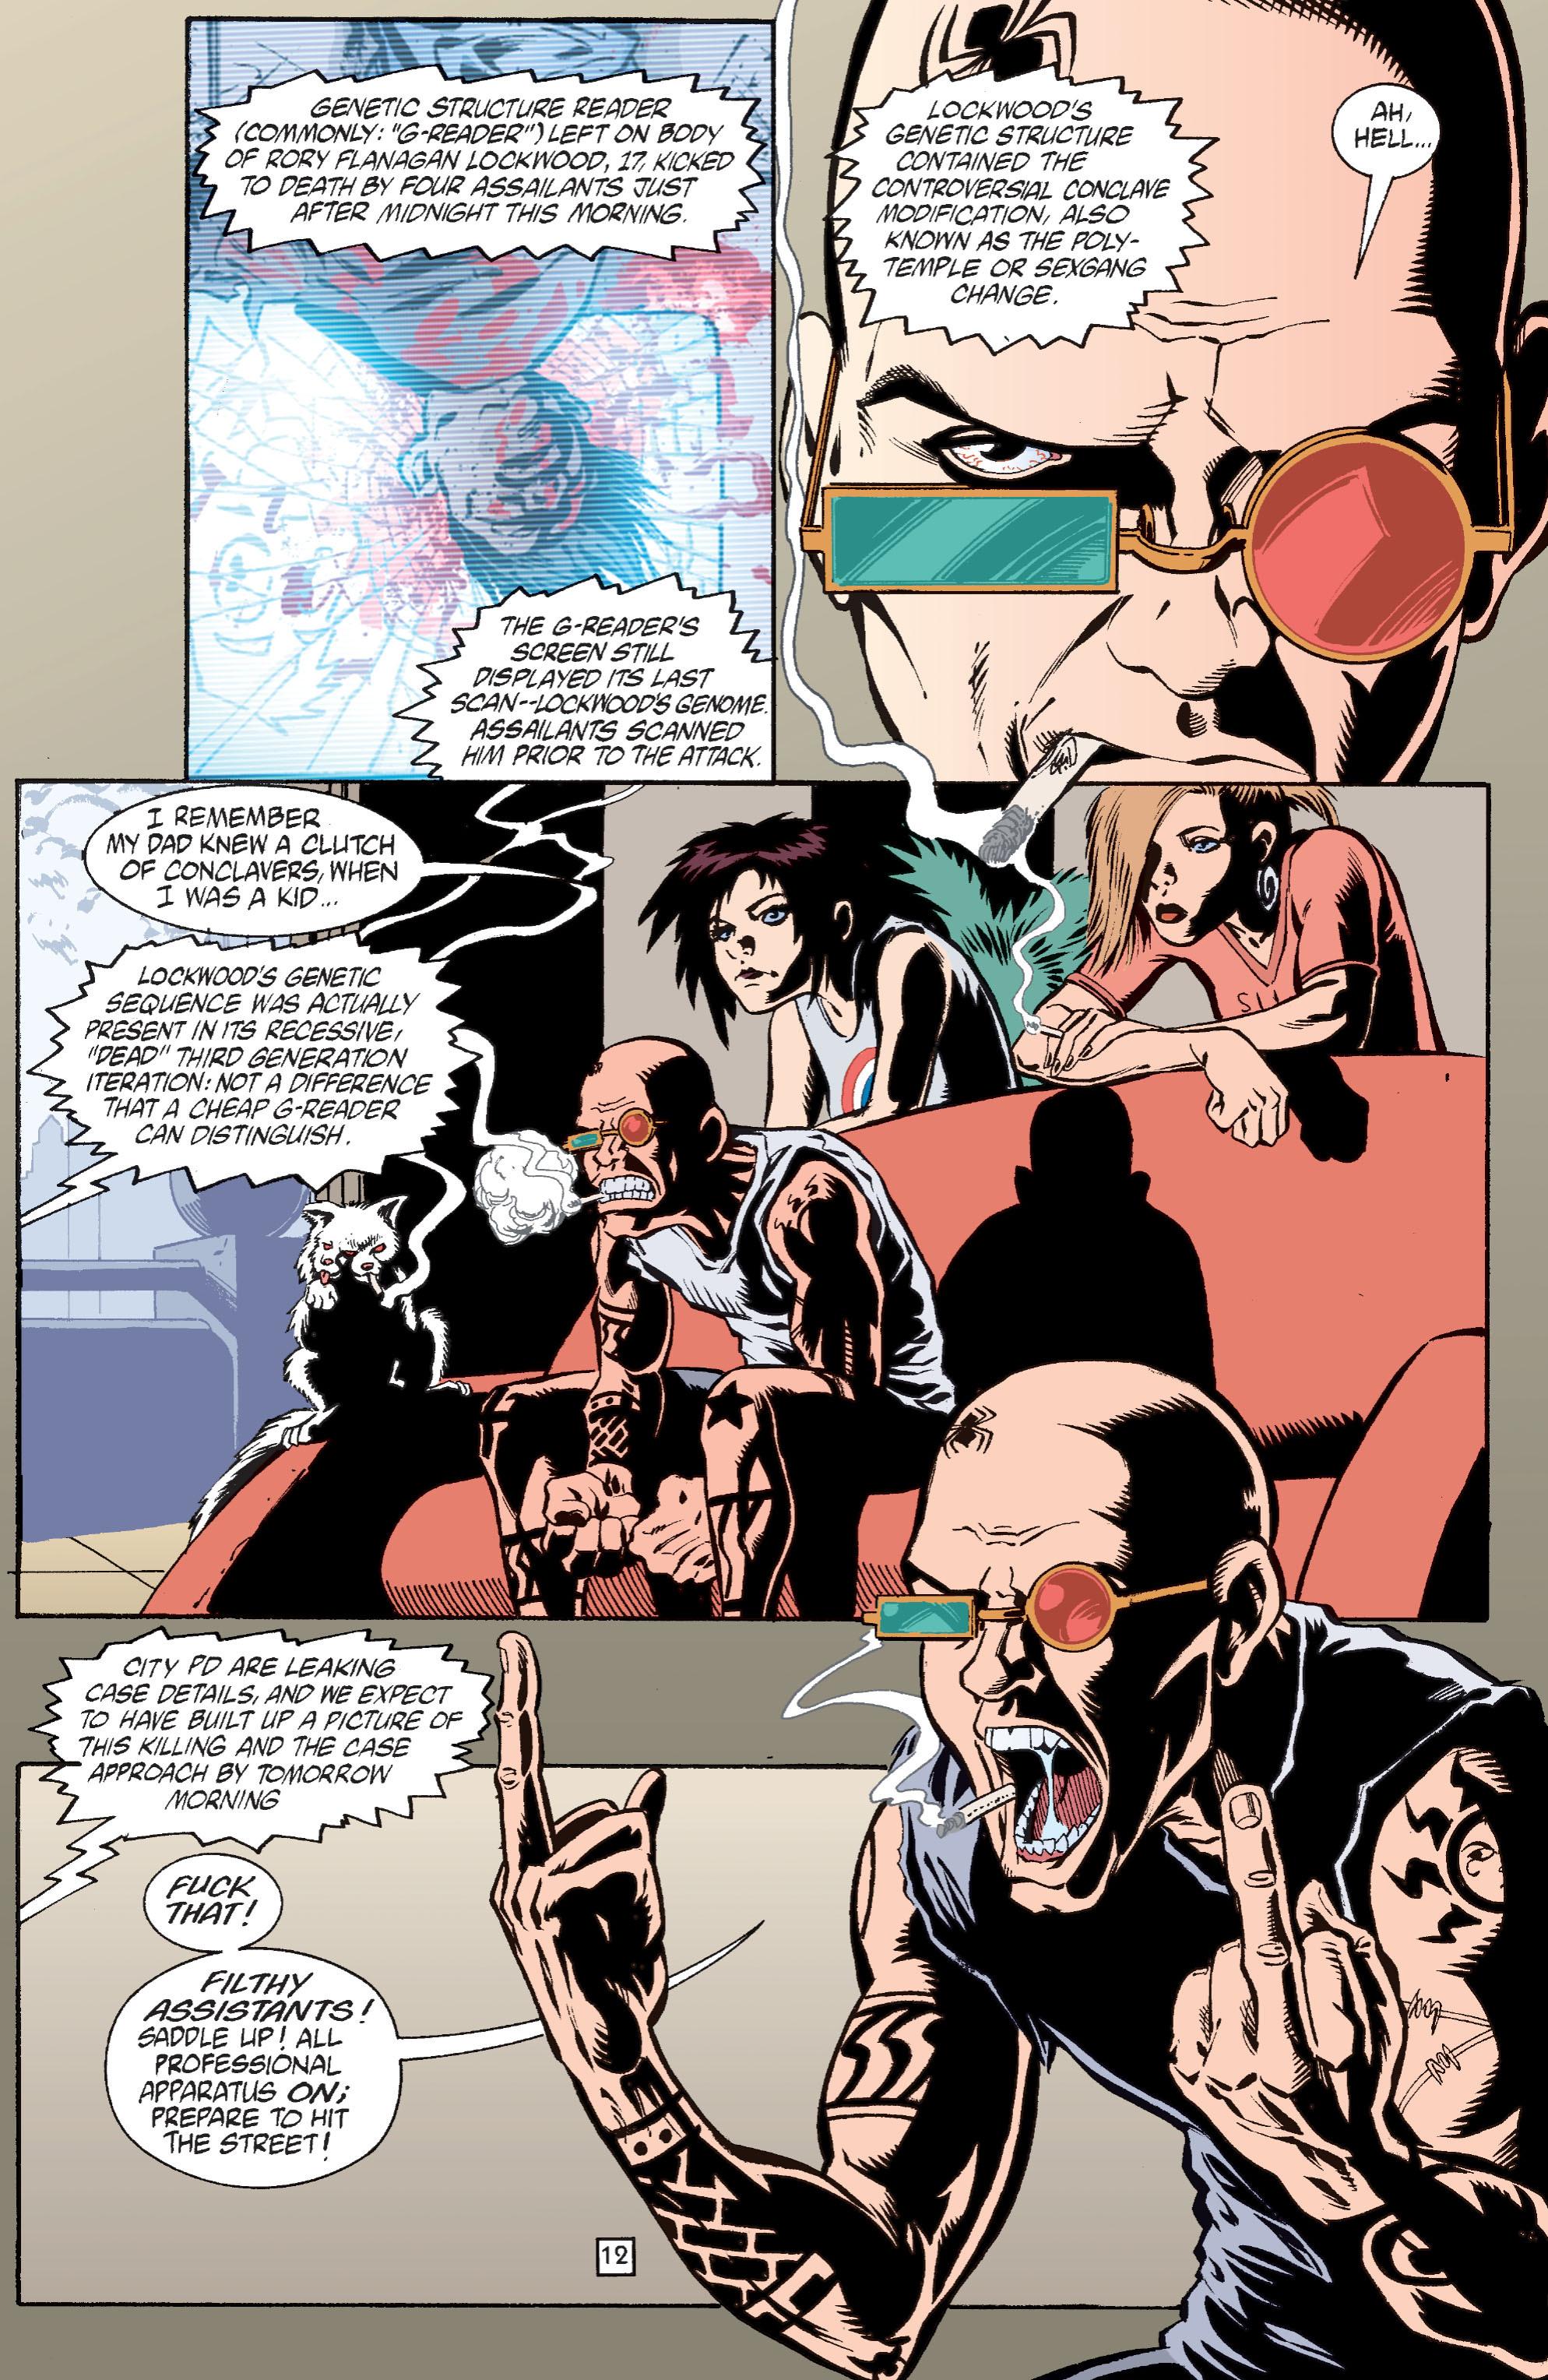 Read online Transmetropolitan comic -  Issue #28 - 13